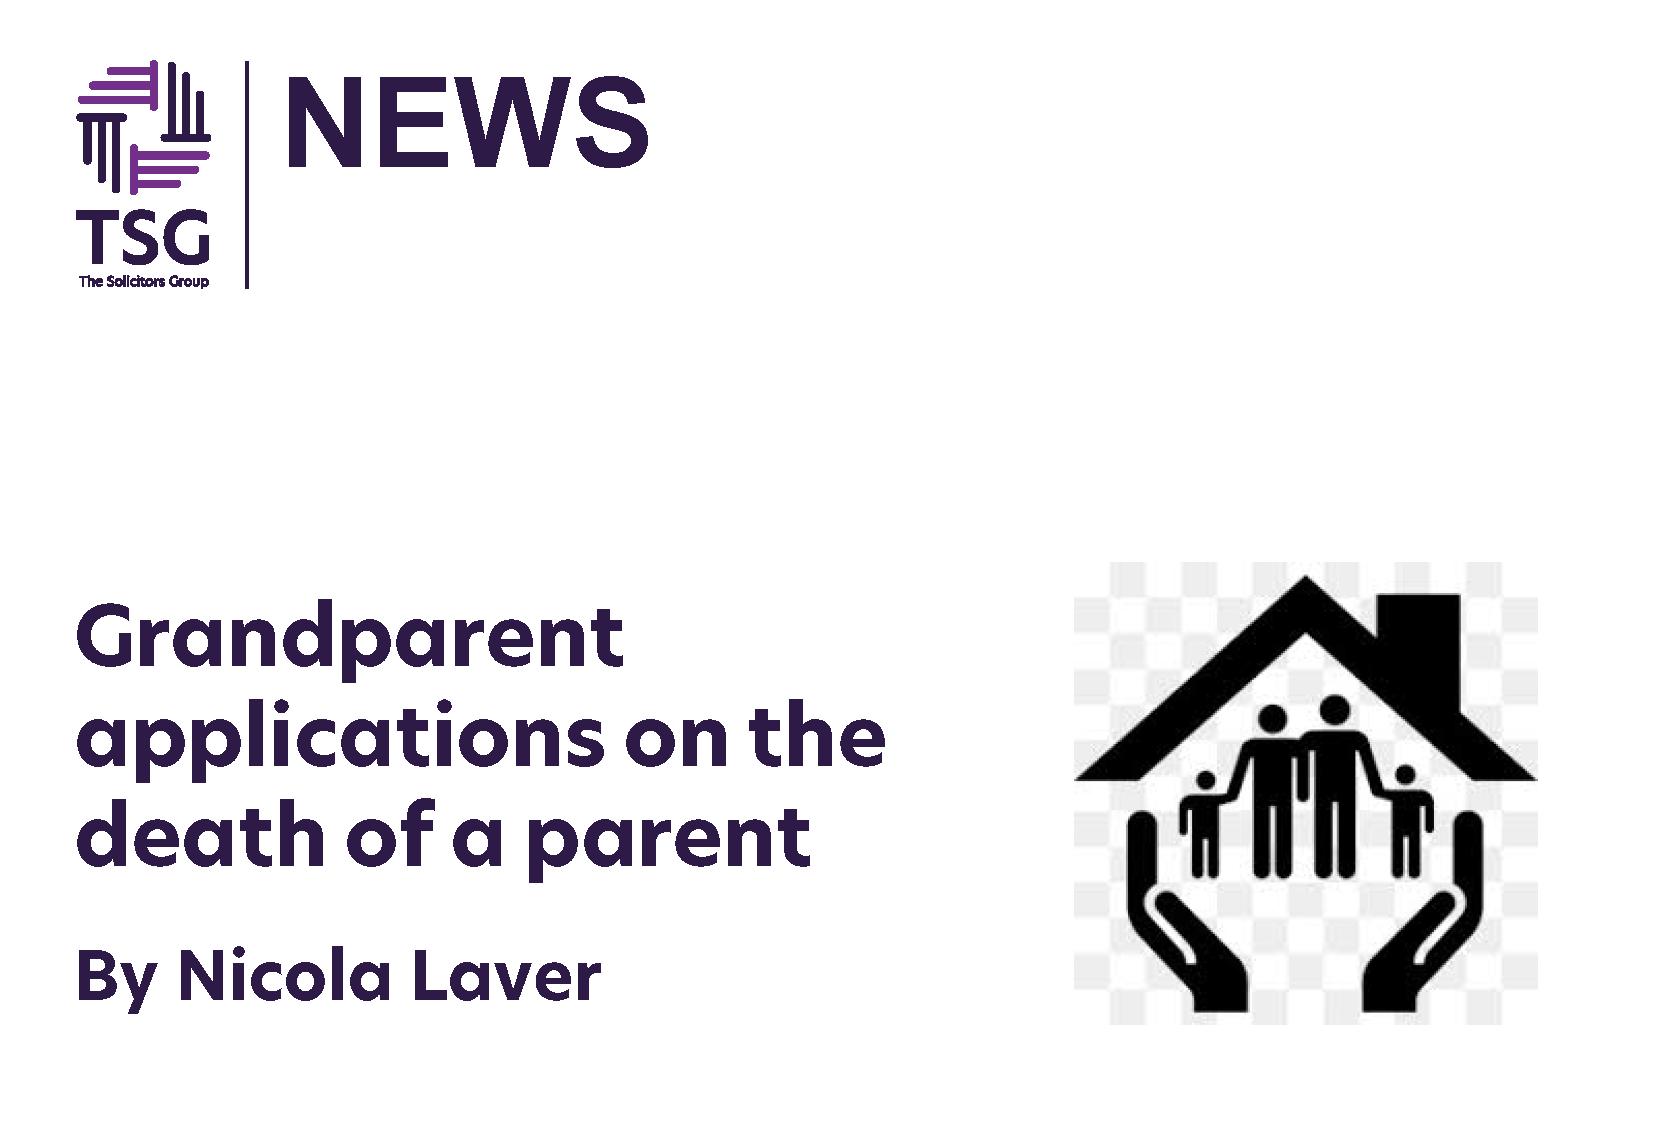 Grandparent applications on the death of a parent P16